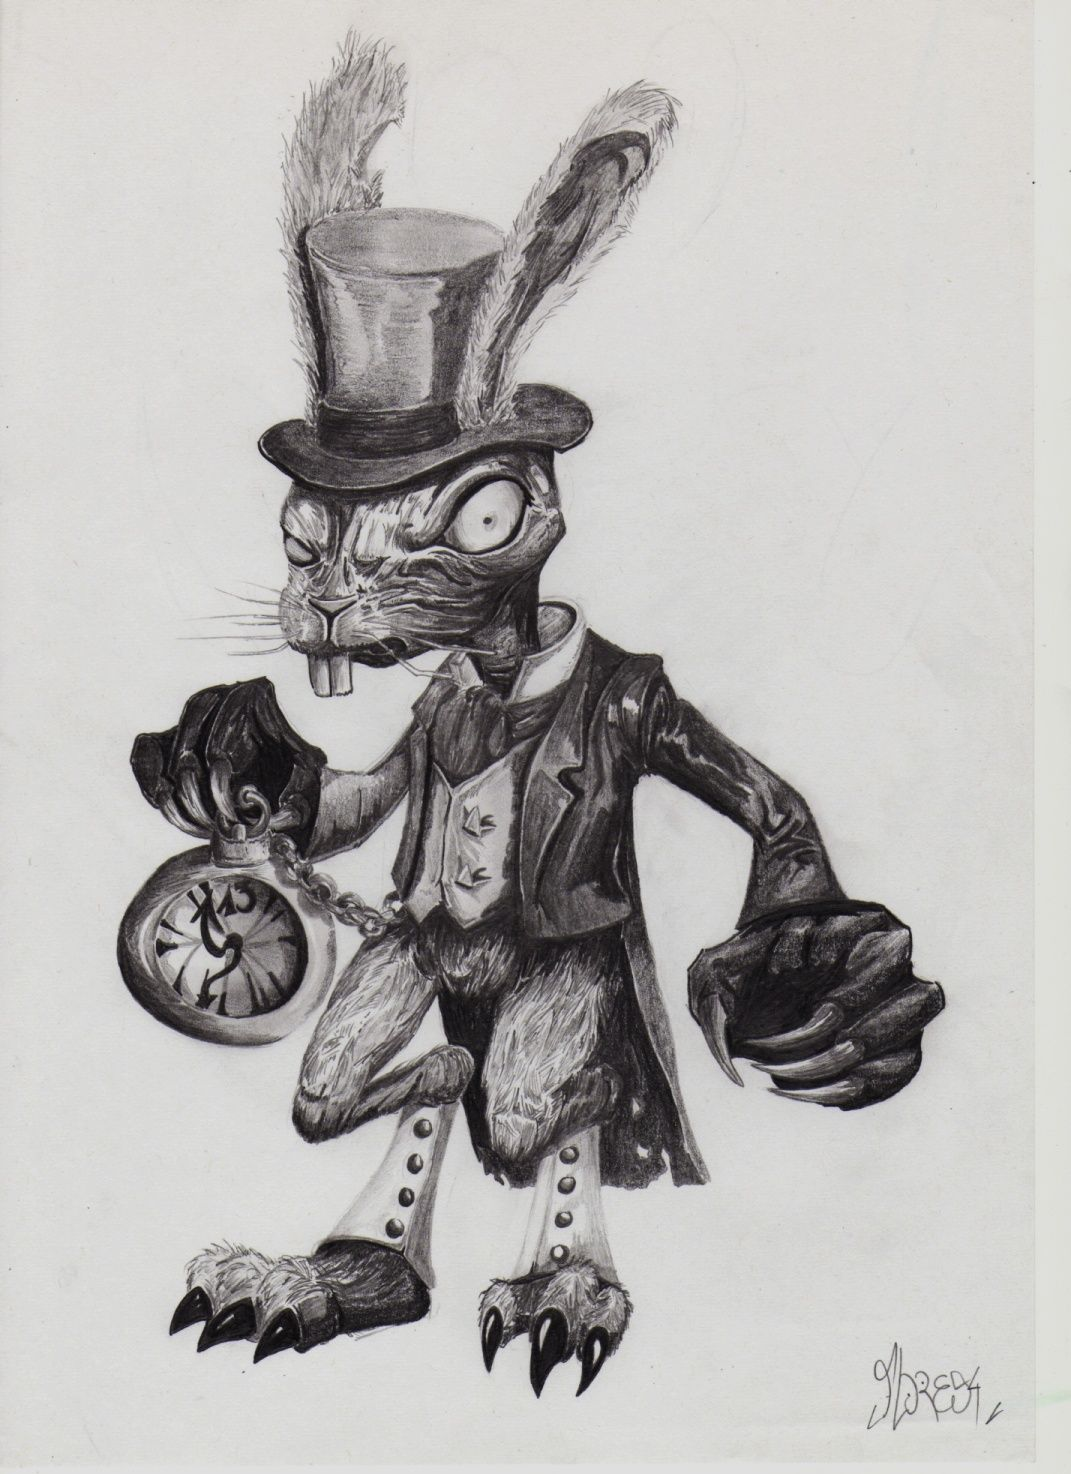 Alice's Evil Rabbit by Wax3212 | Kaninchen kunst - photo#37